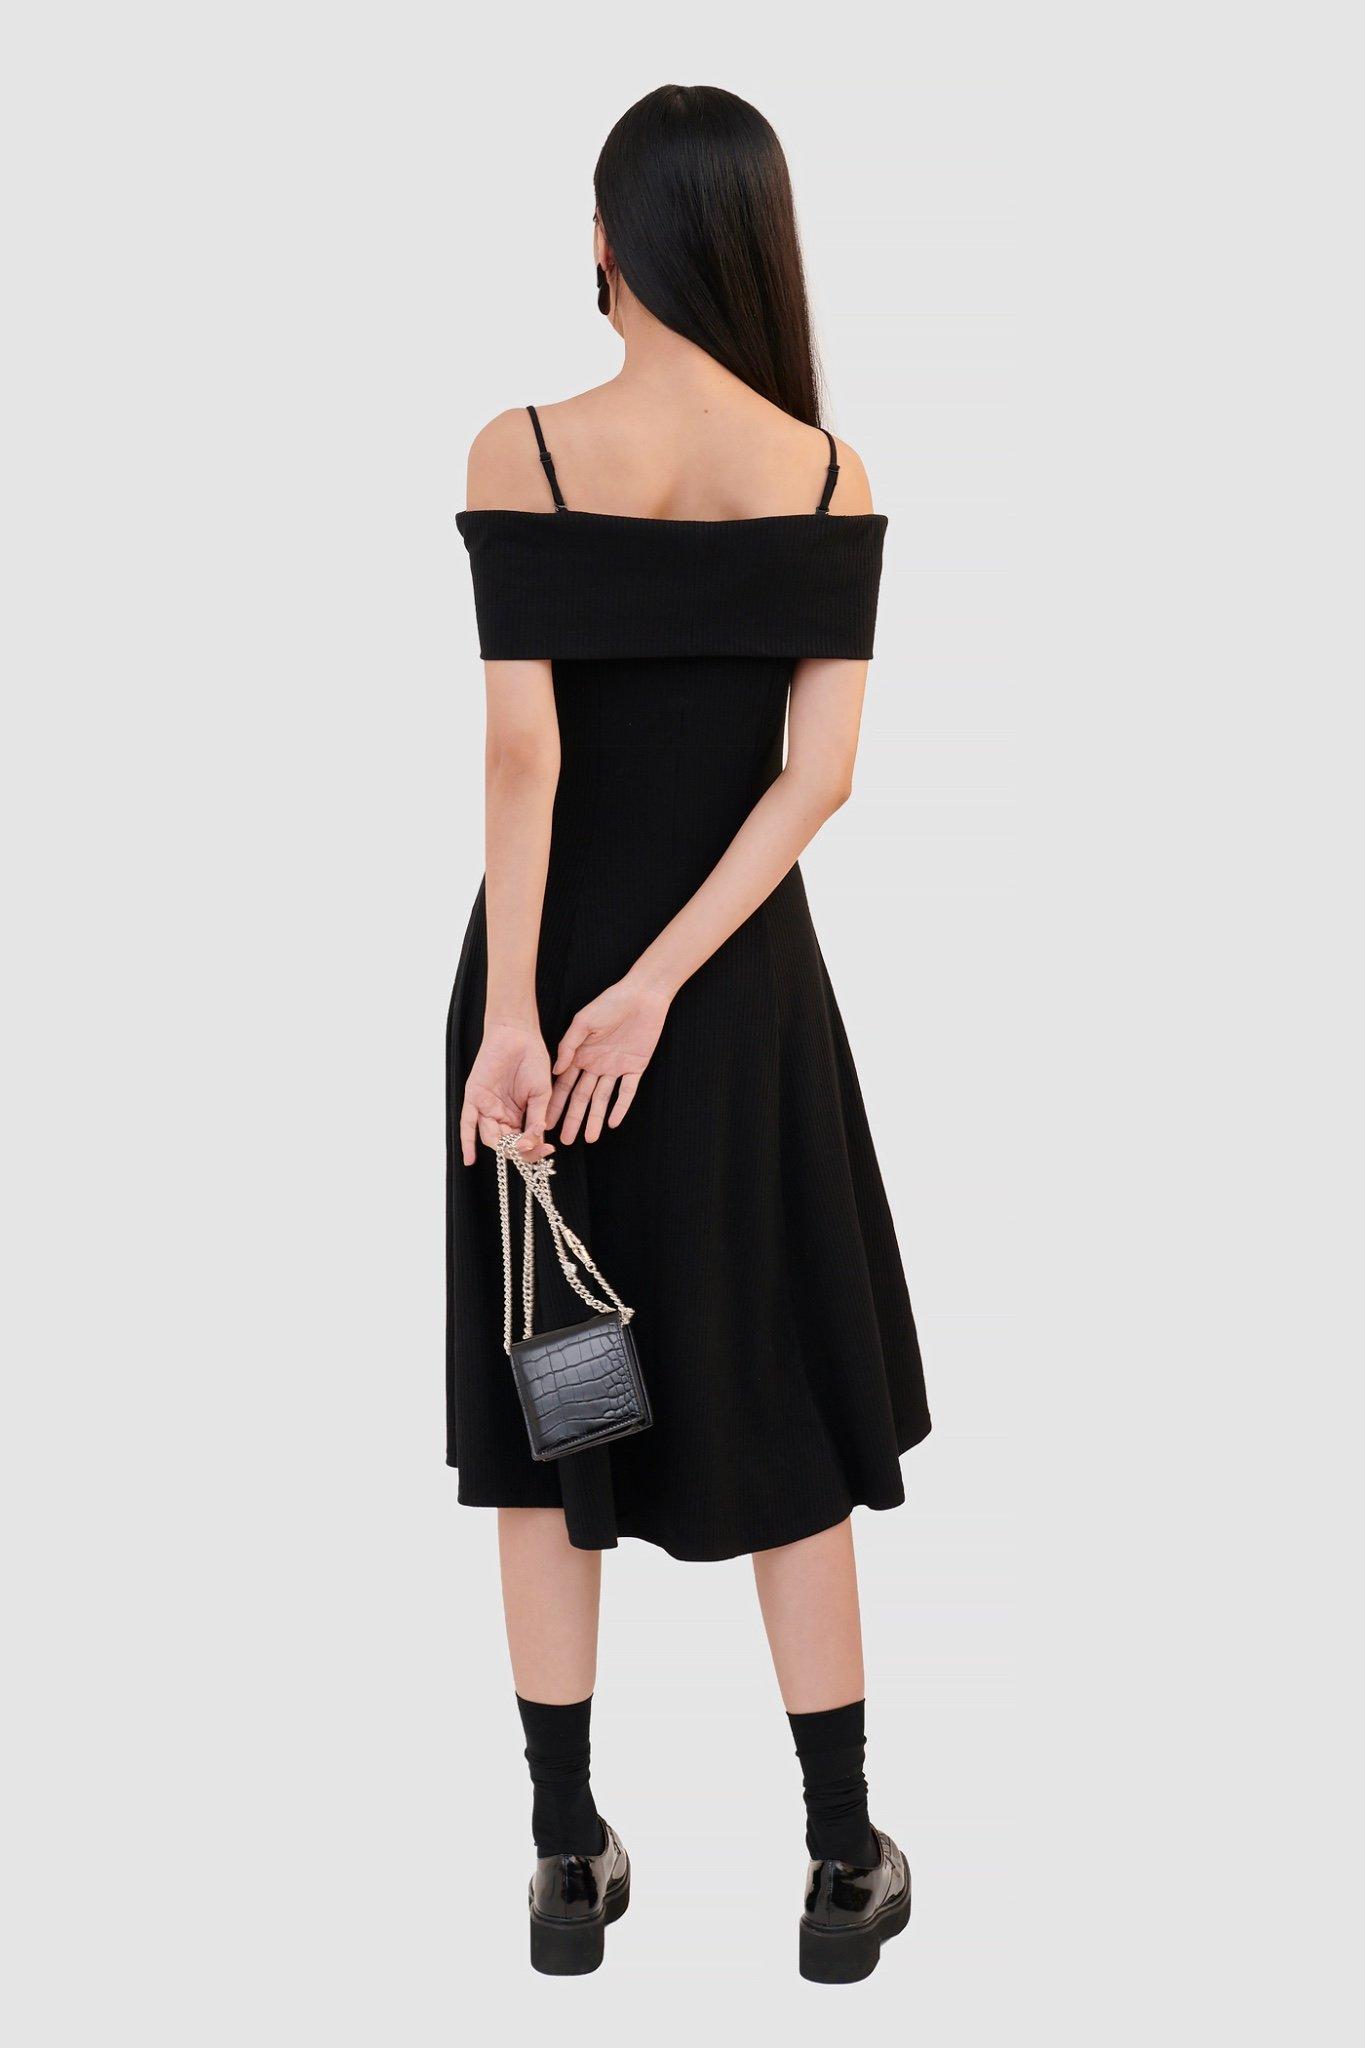 Đầm knit midi trễ vai